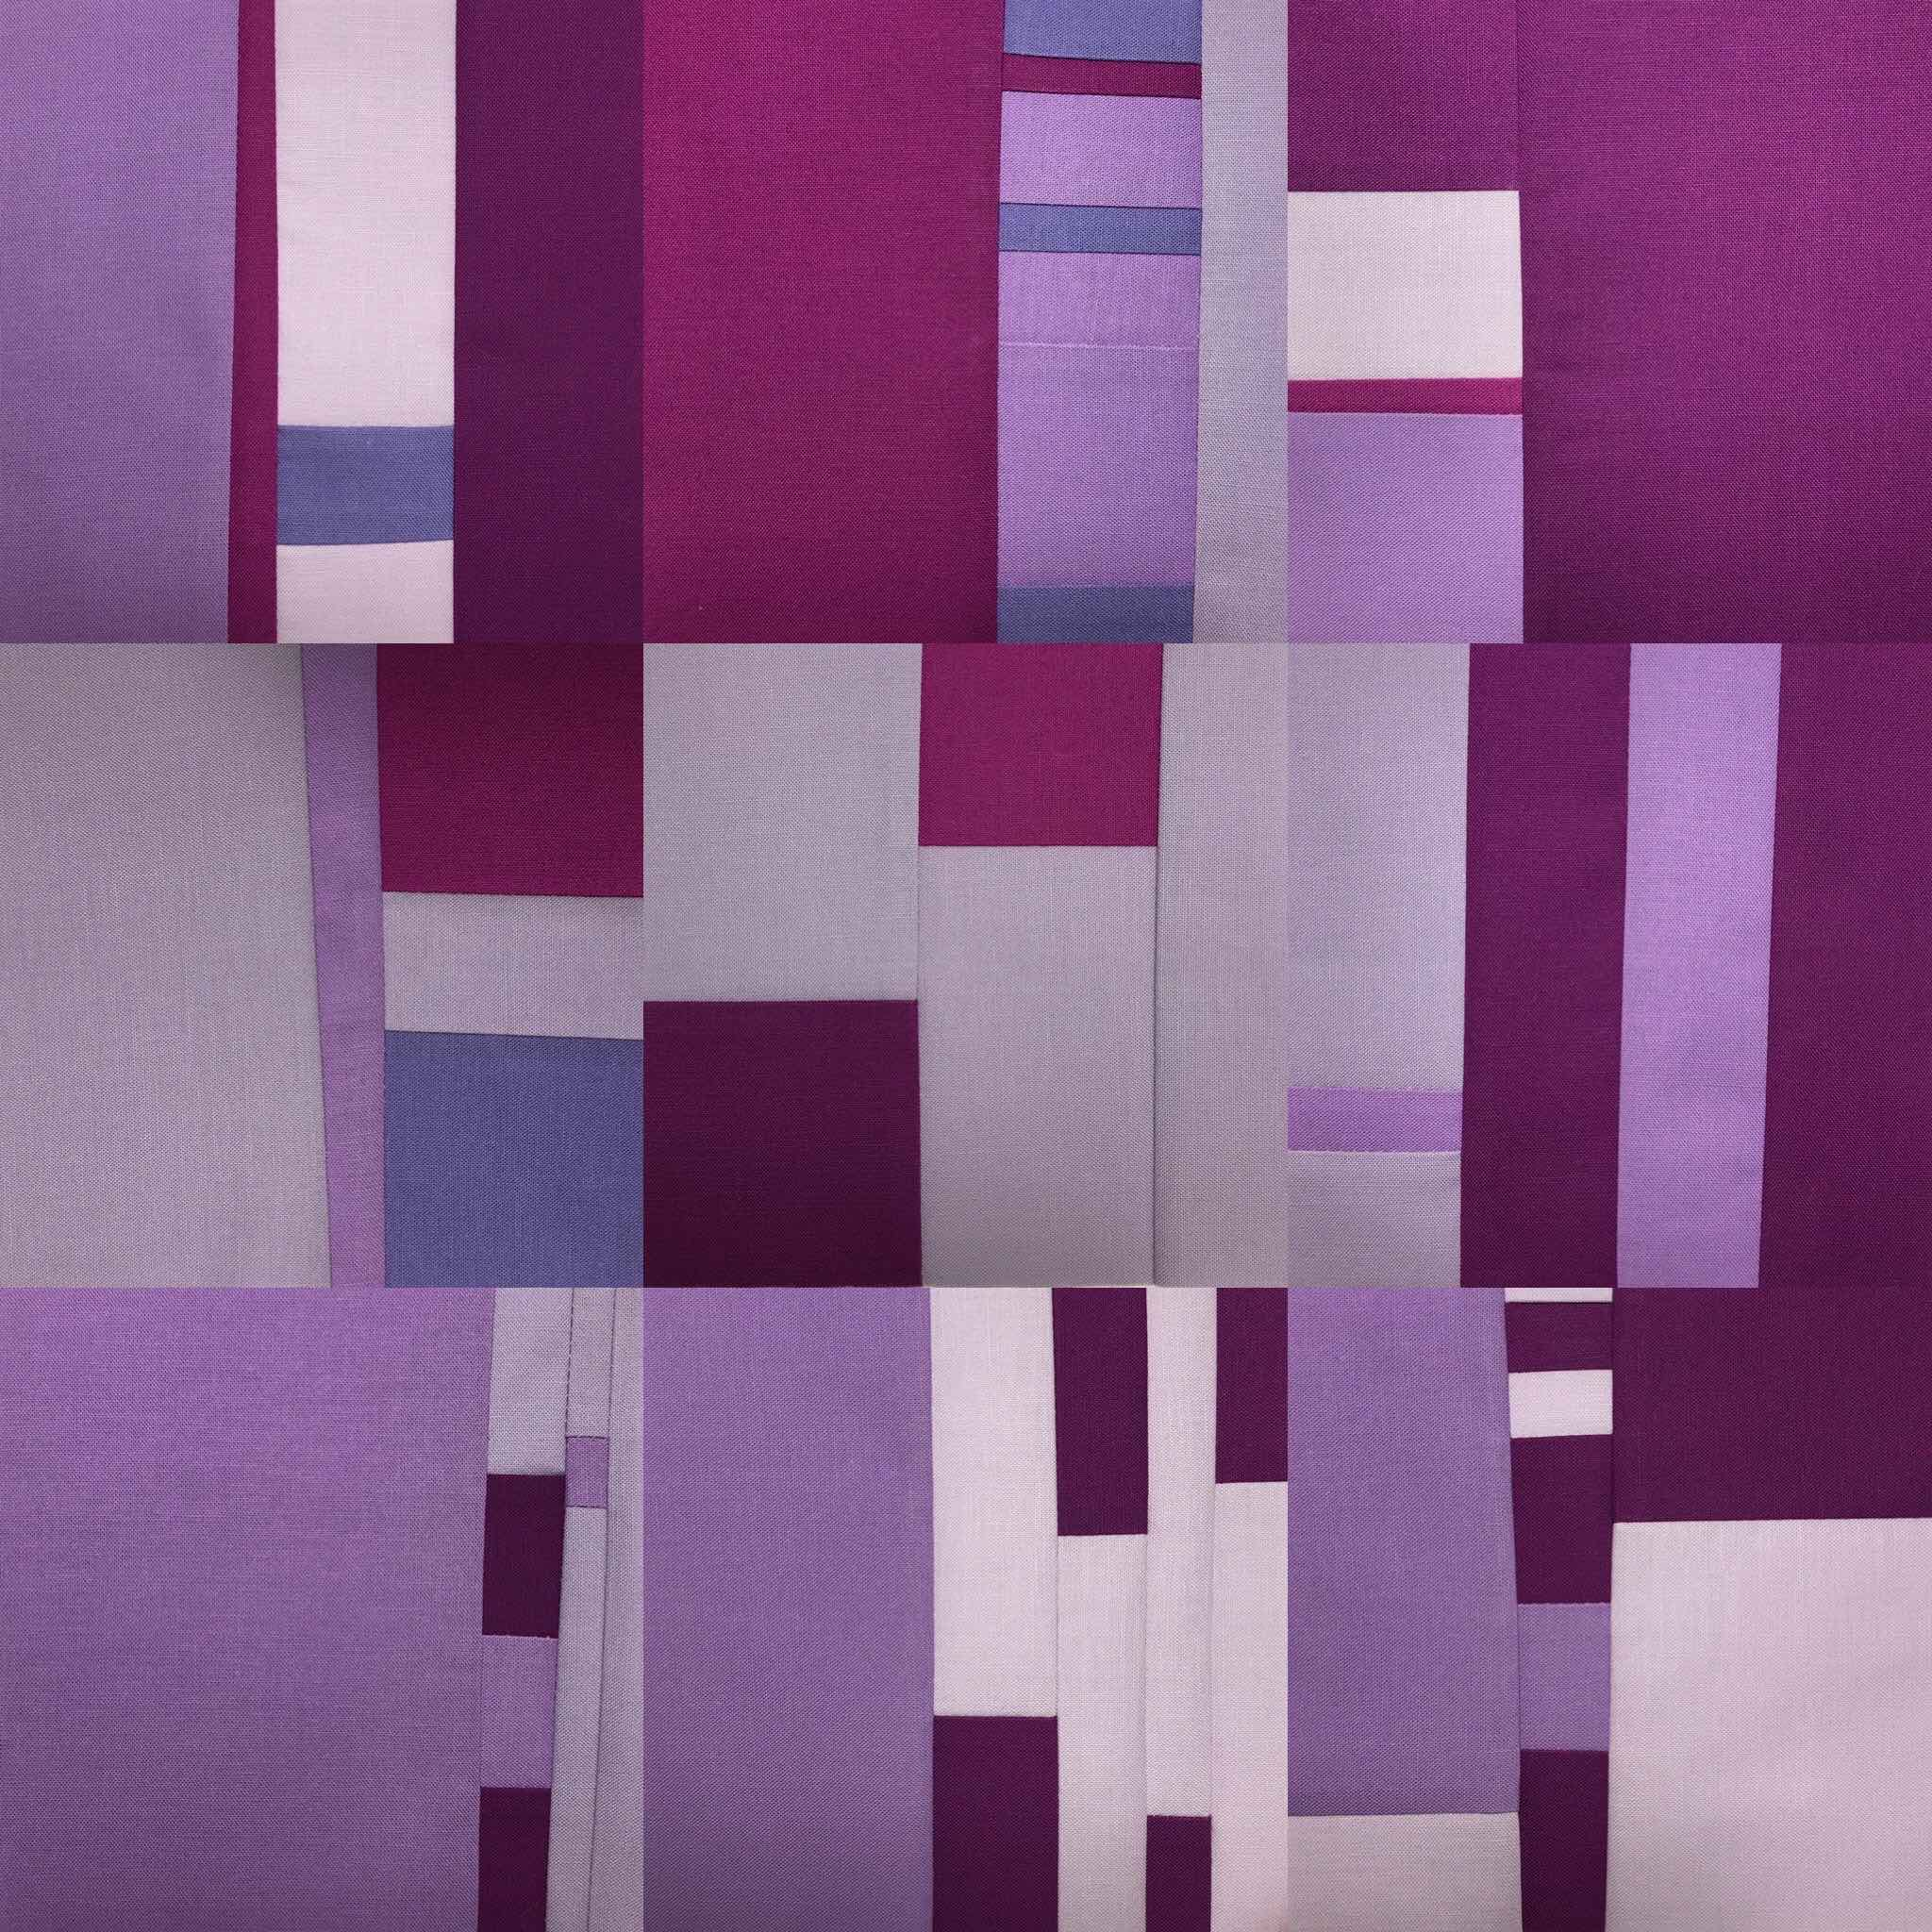 Nine Daily sewn squares of 25 Days of Purple Irises